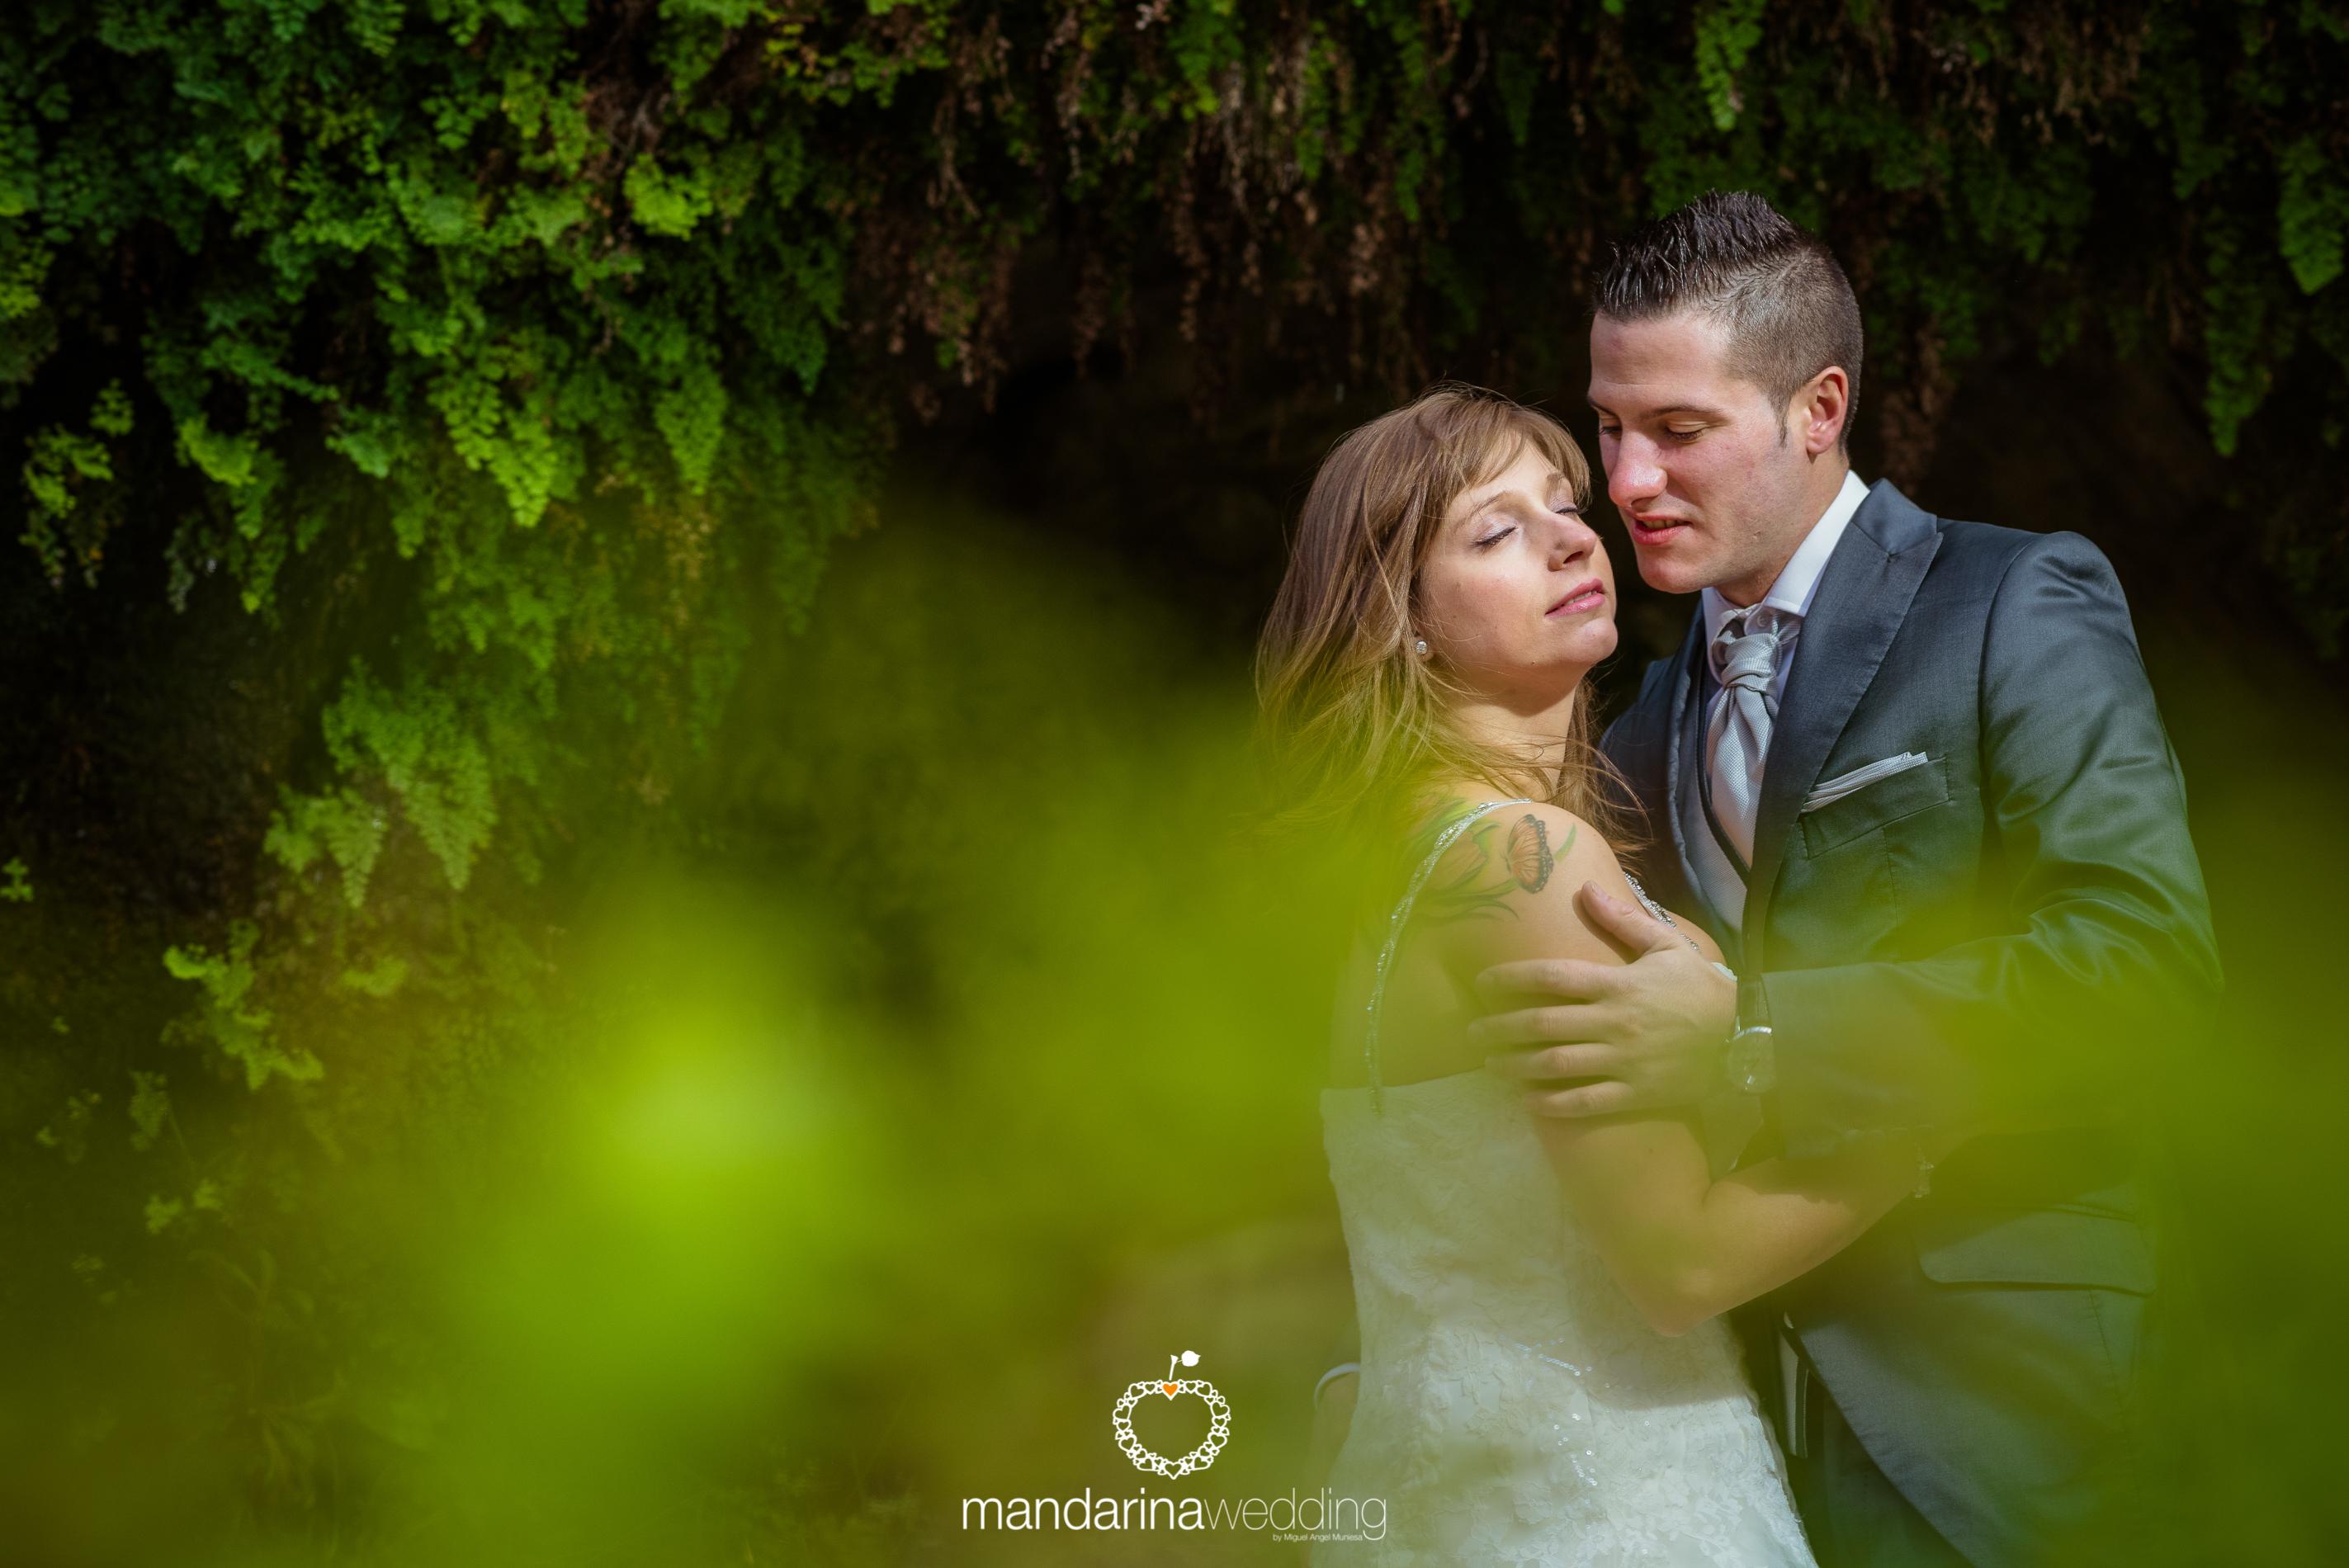 mandarina wedding, fotogarfos boda zaragoza, postboda, postboda en oliete, fotografos boda teruel, fotografos huesca_03